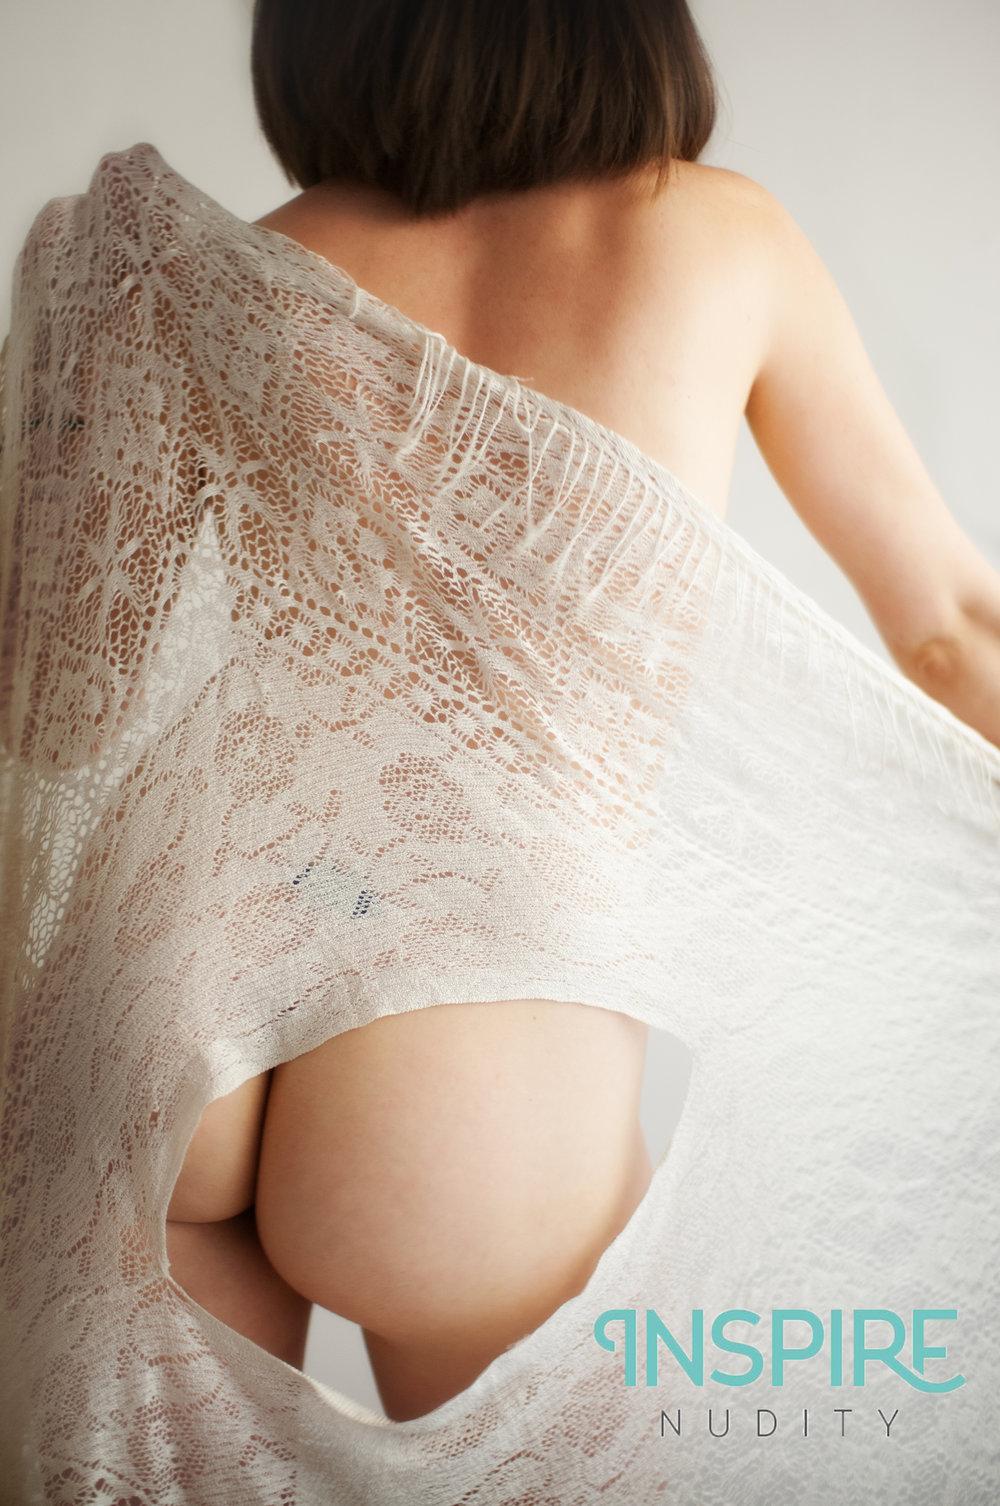 Inspire nudity -